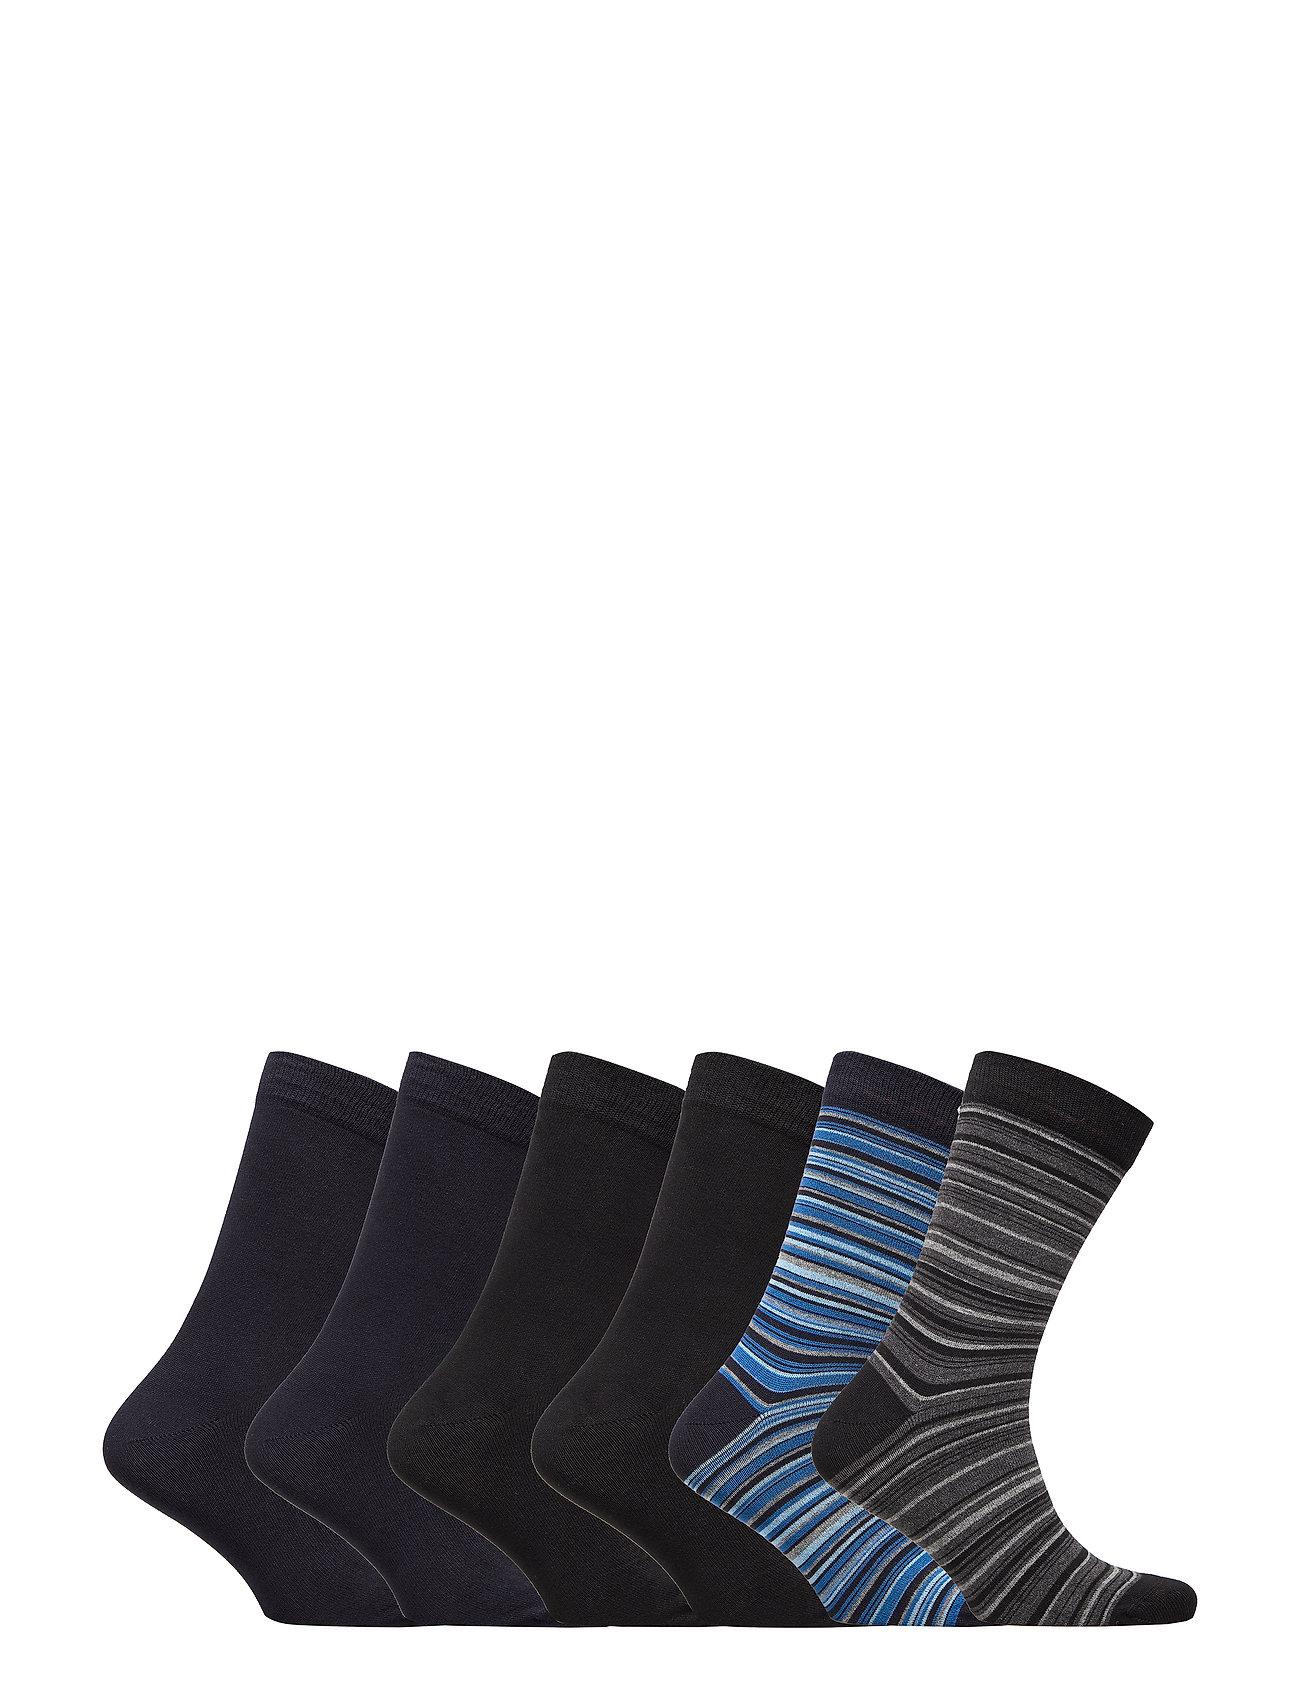 Lindbergh Gift box socks - MIX